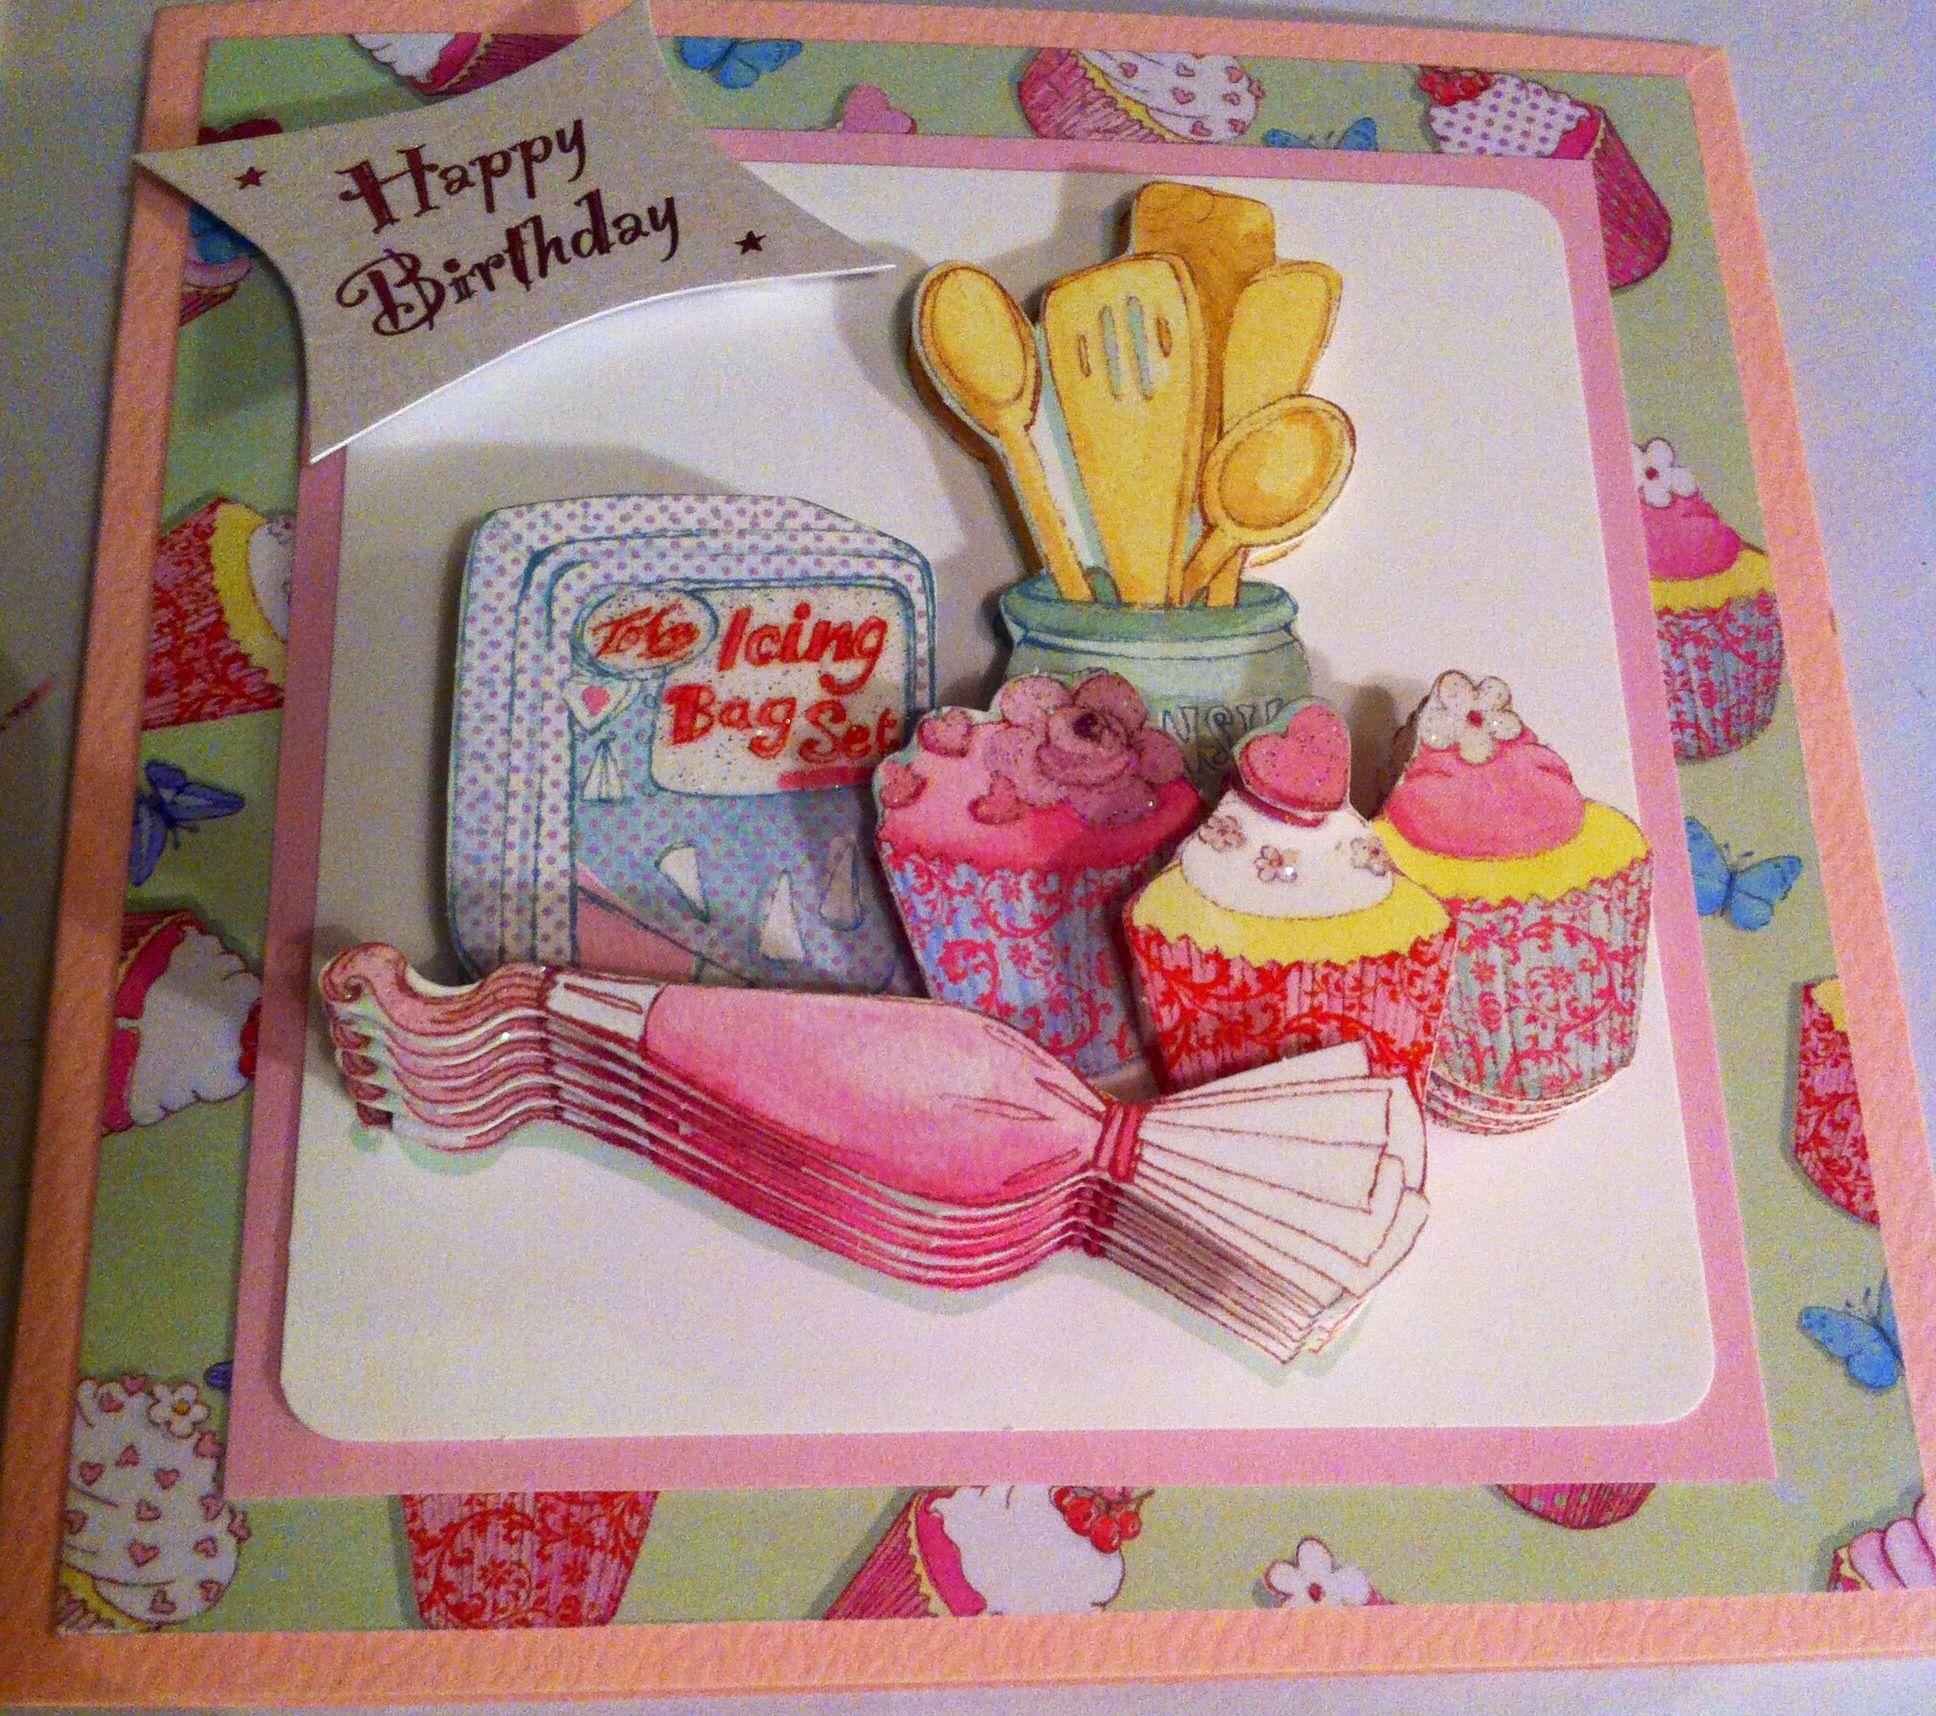 Cupcake icing handmade card design card making inspiration